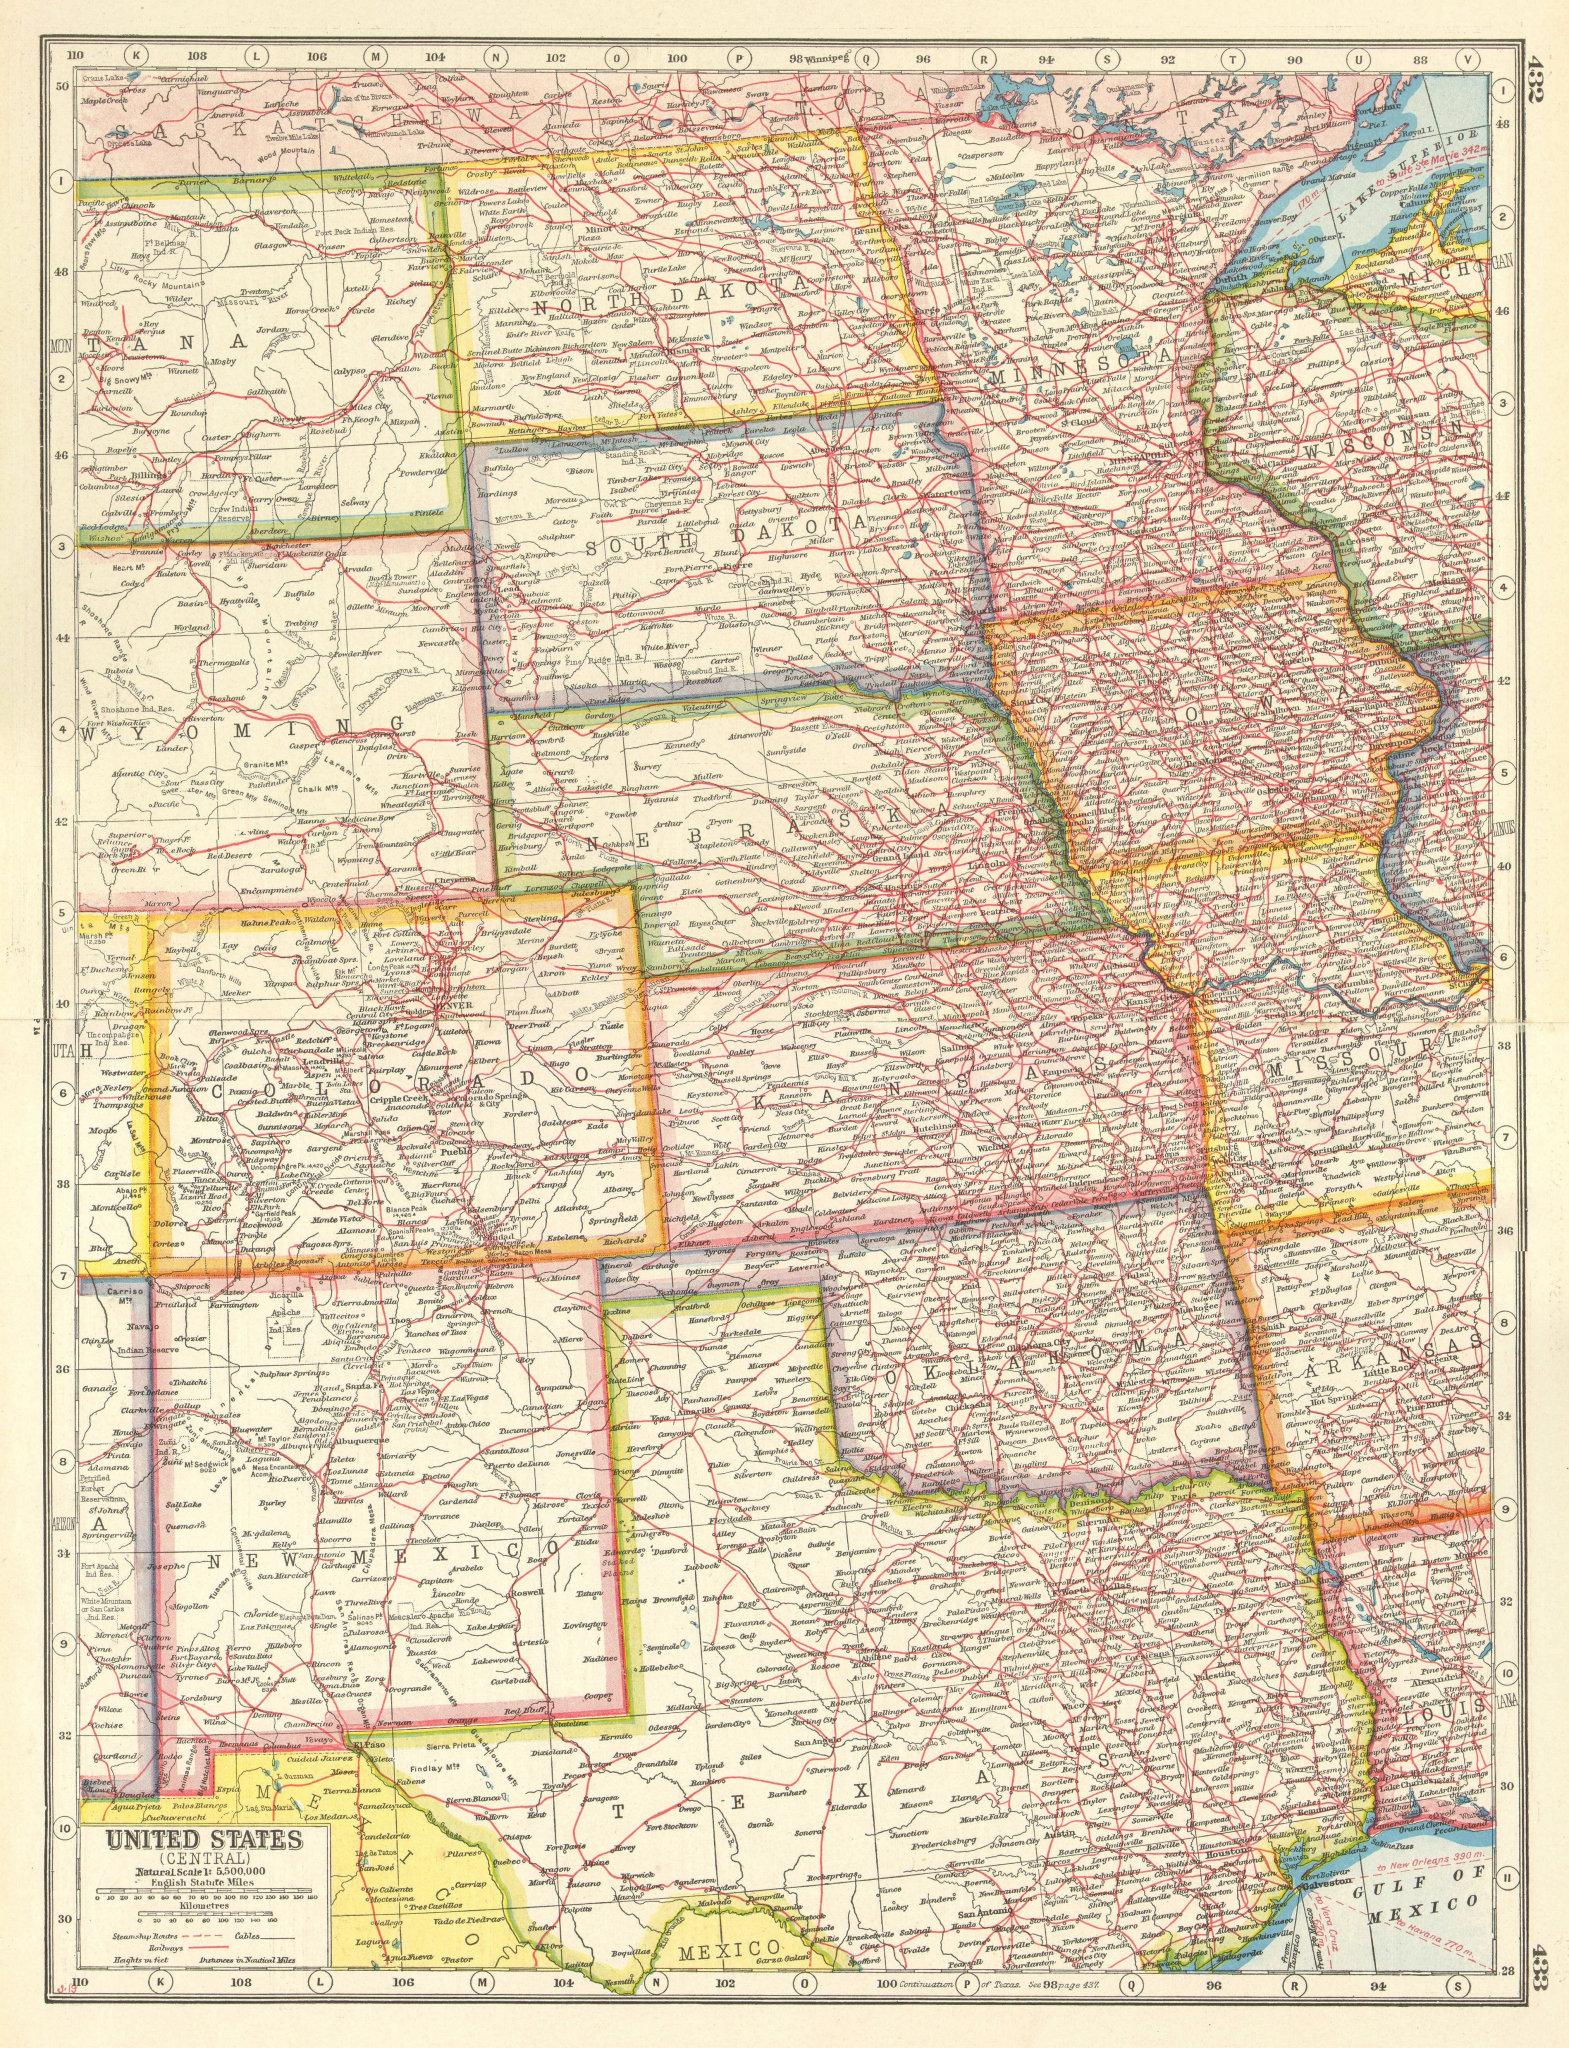 Associate Product USA PLAINS STATES. ND SD NE MN IA NM OK Texas.United States.HARMSWORTH 1920 map